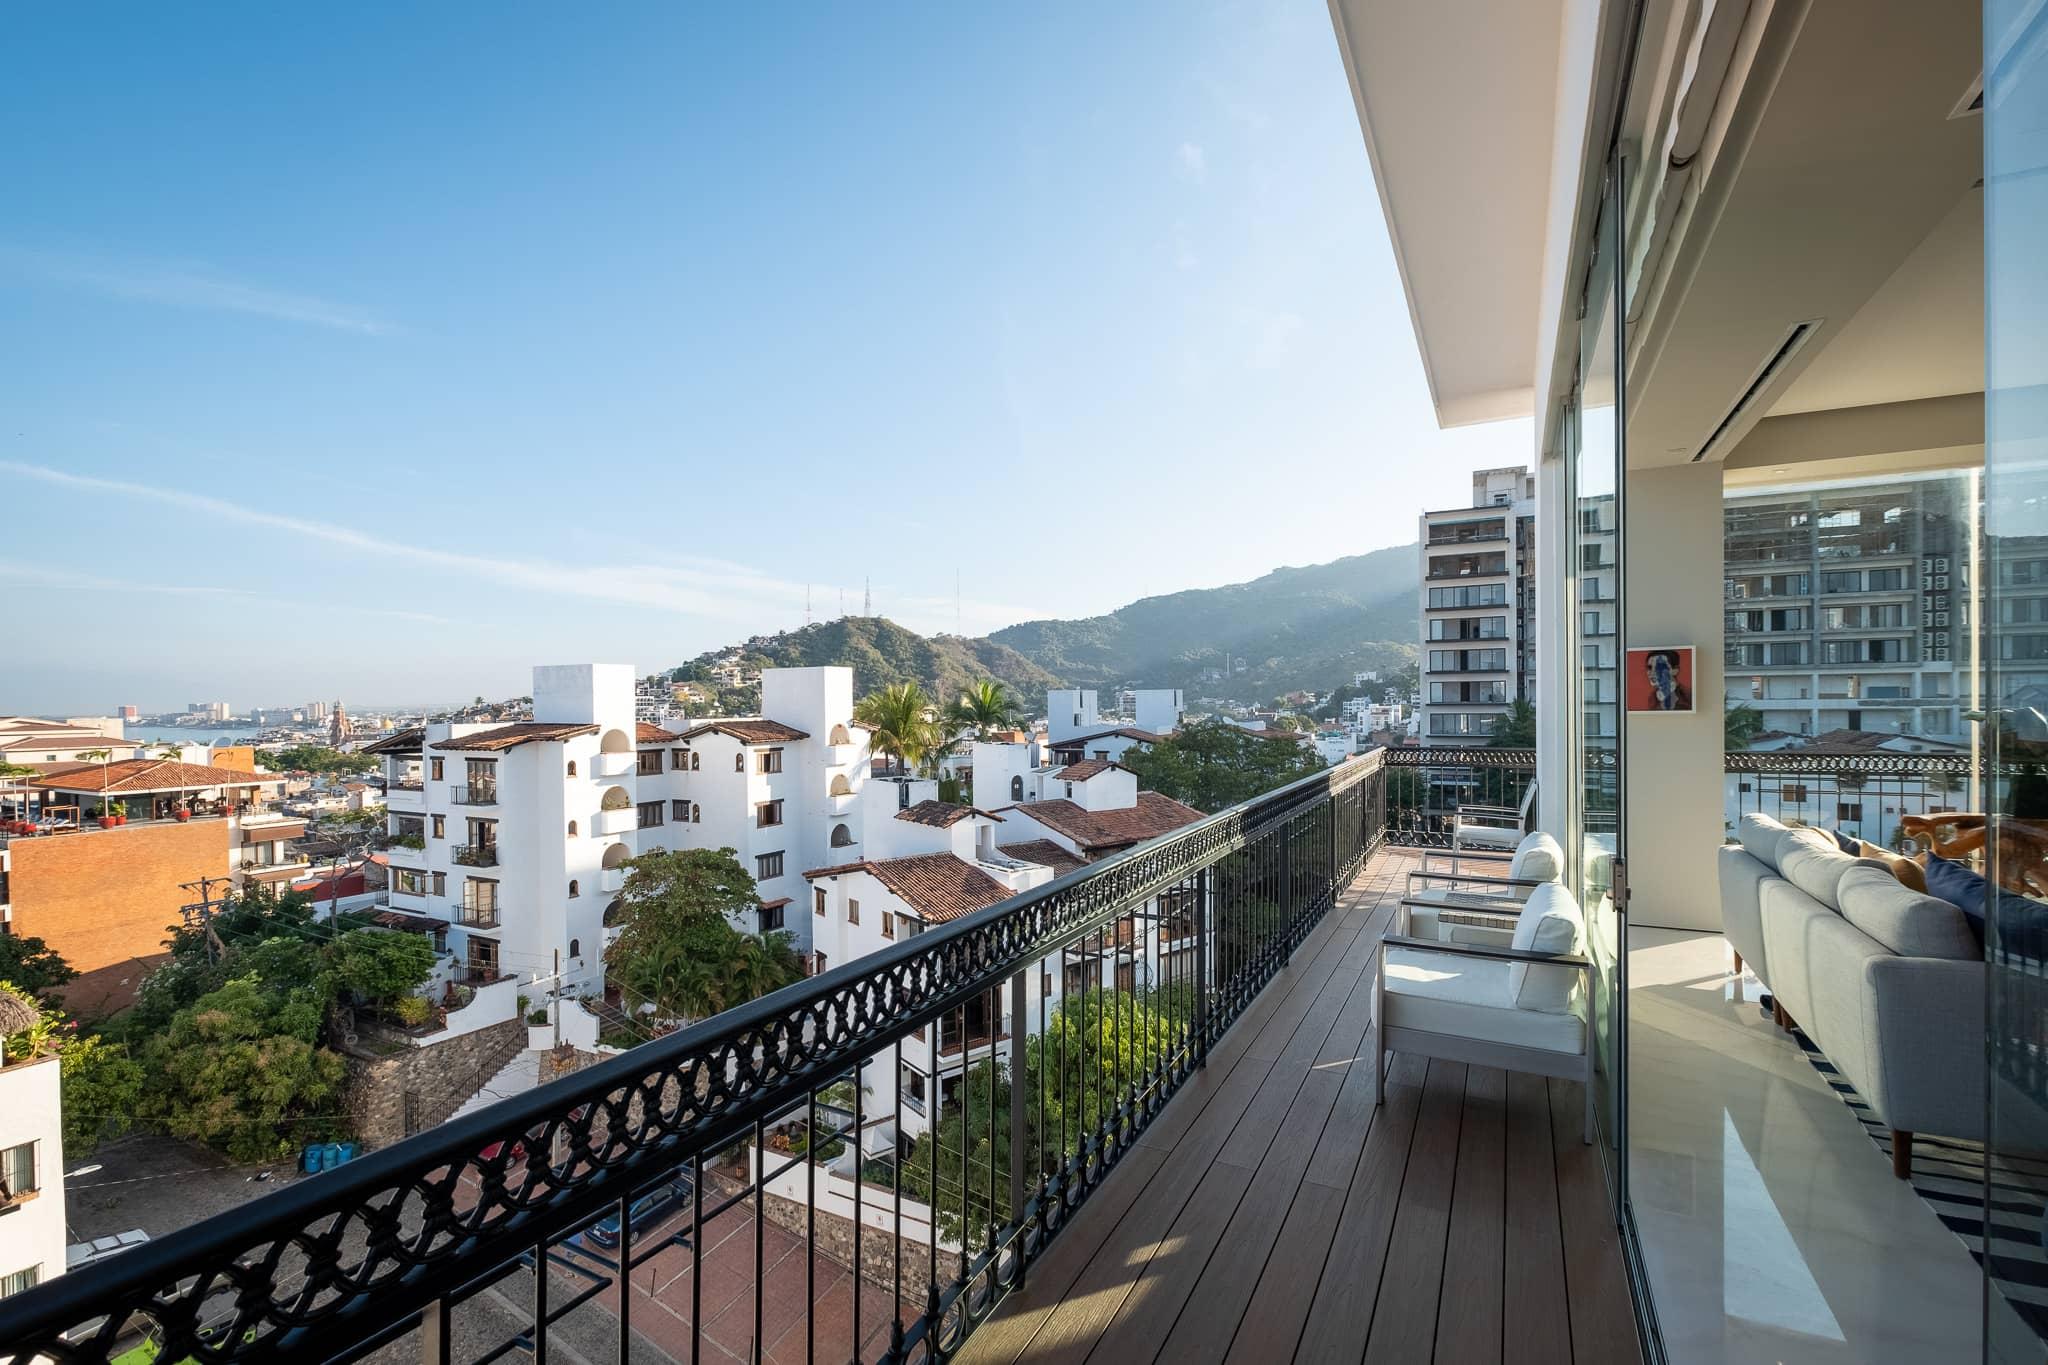 Architecture And Real Estate Photographer Puerto Vallarta 26